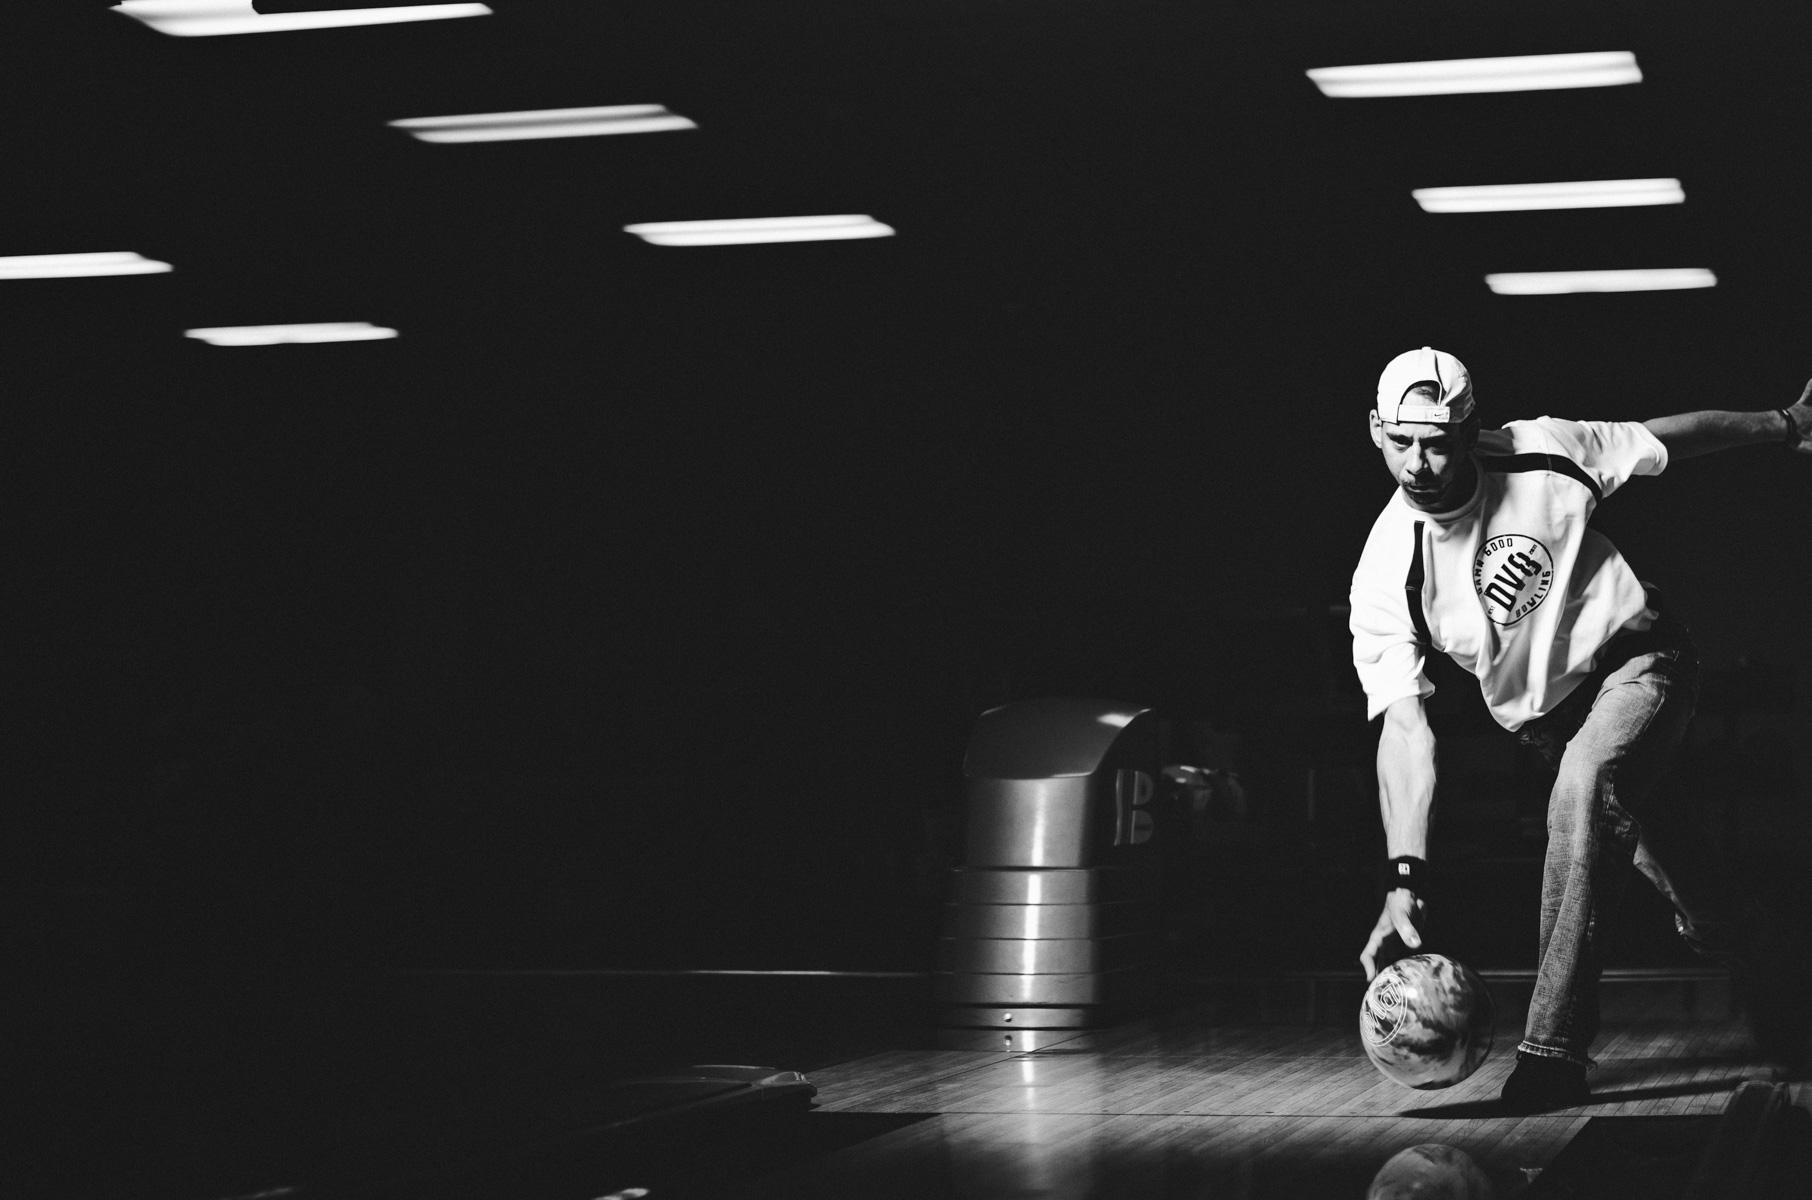 bowling-professional-photos-104.jpg